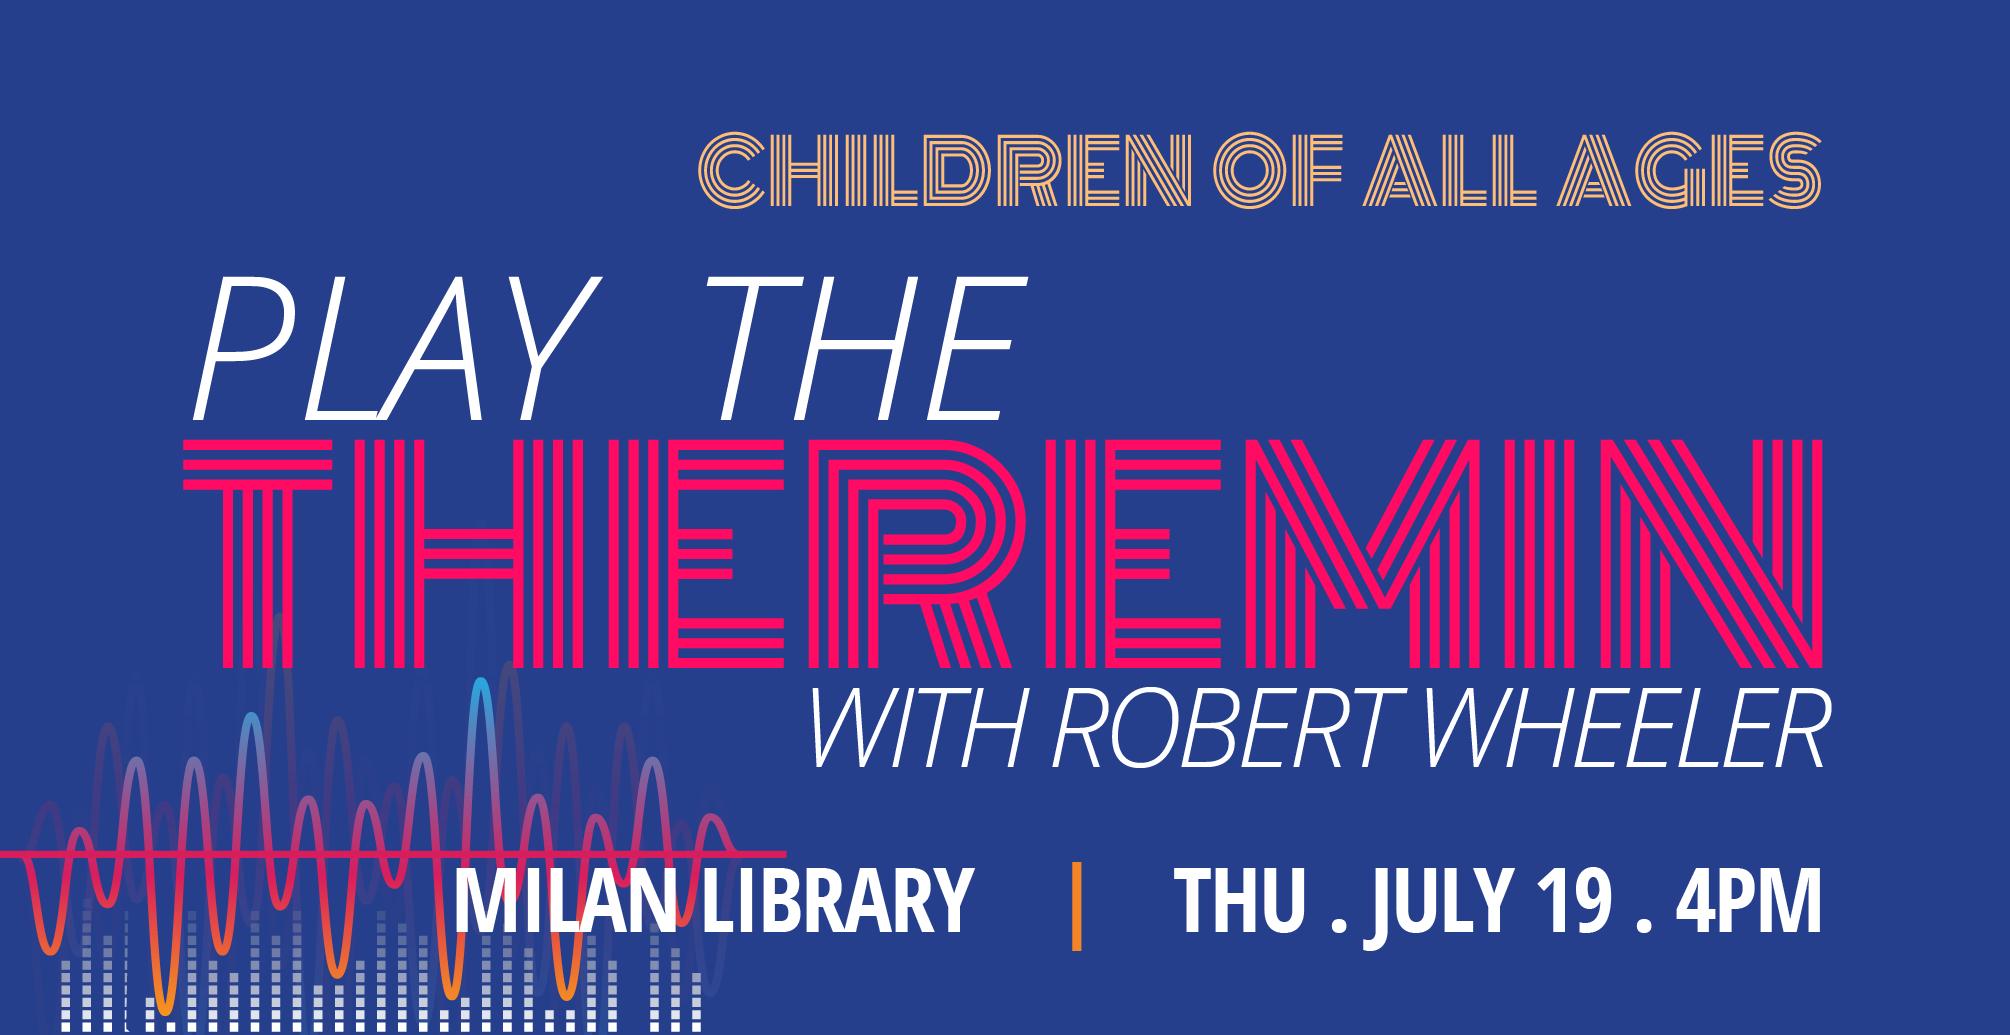 2018-07-CHILDRENS-Milan-Robert-Wheeler-Slide